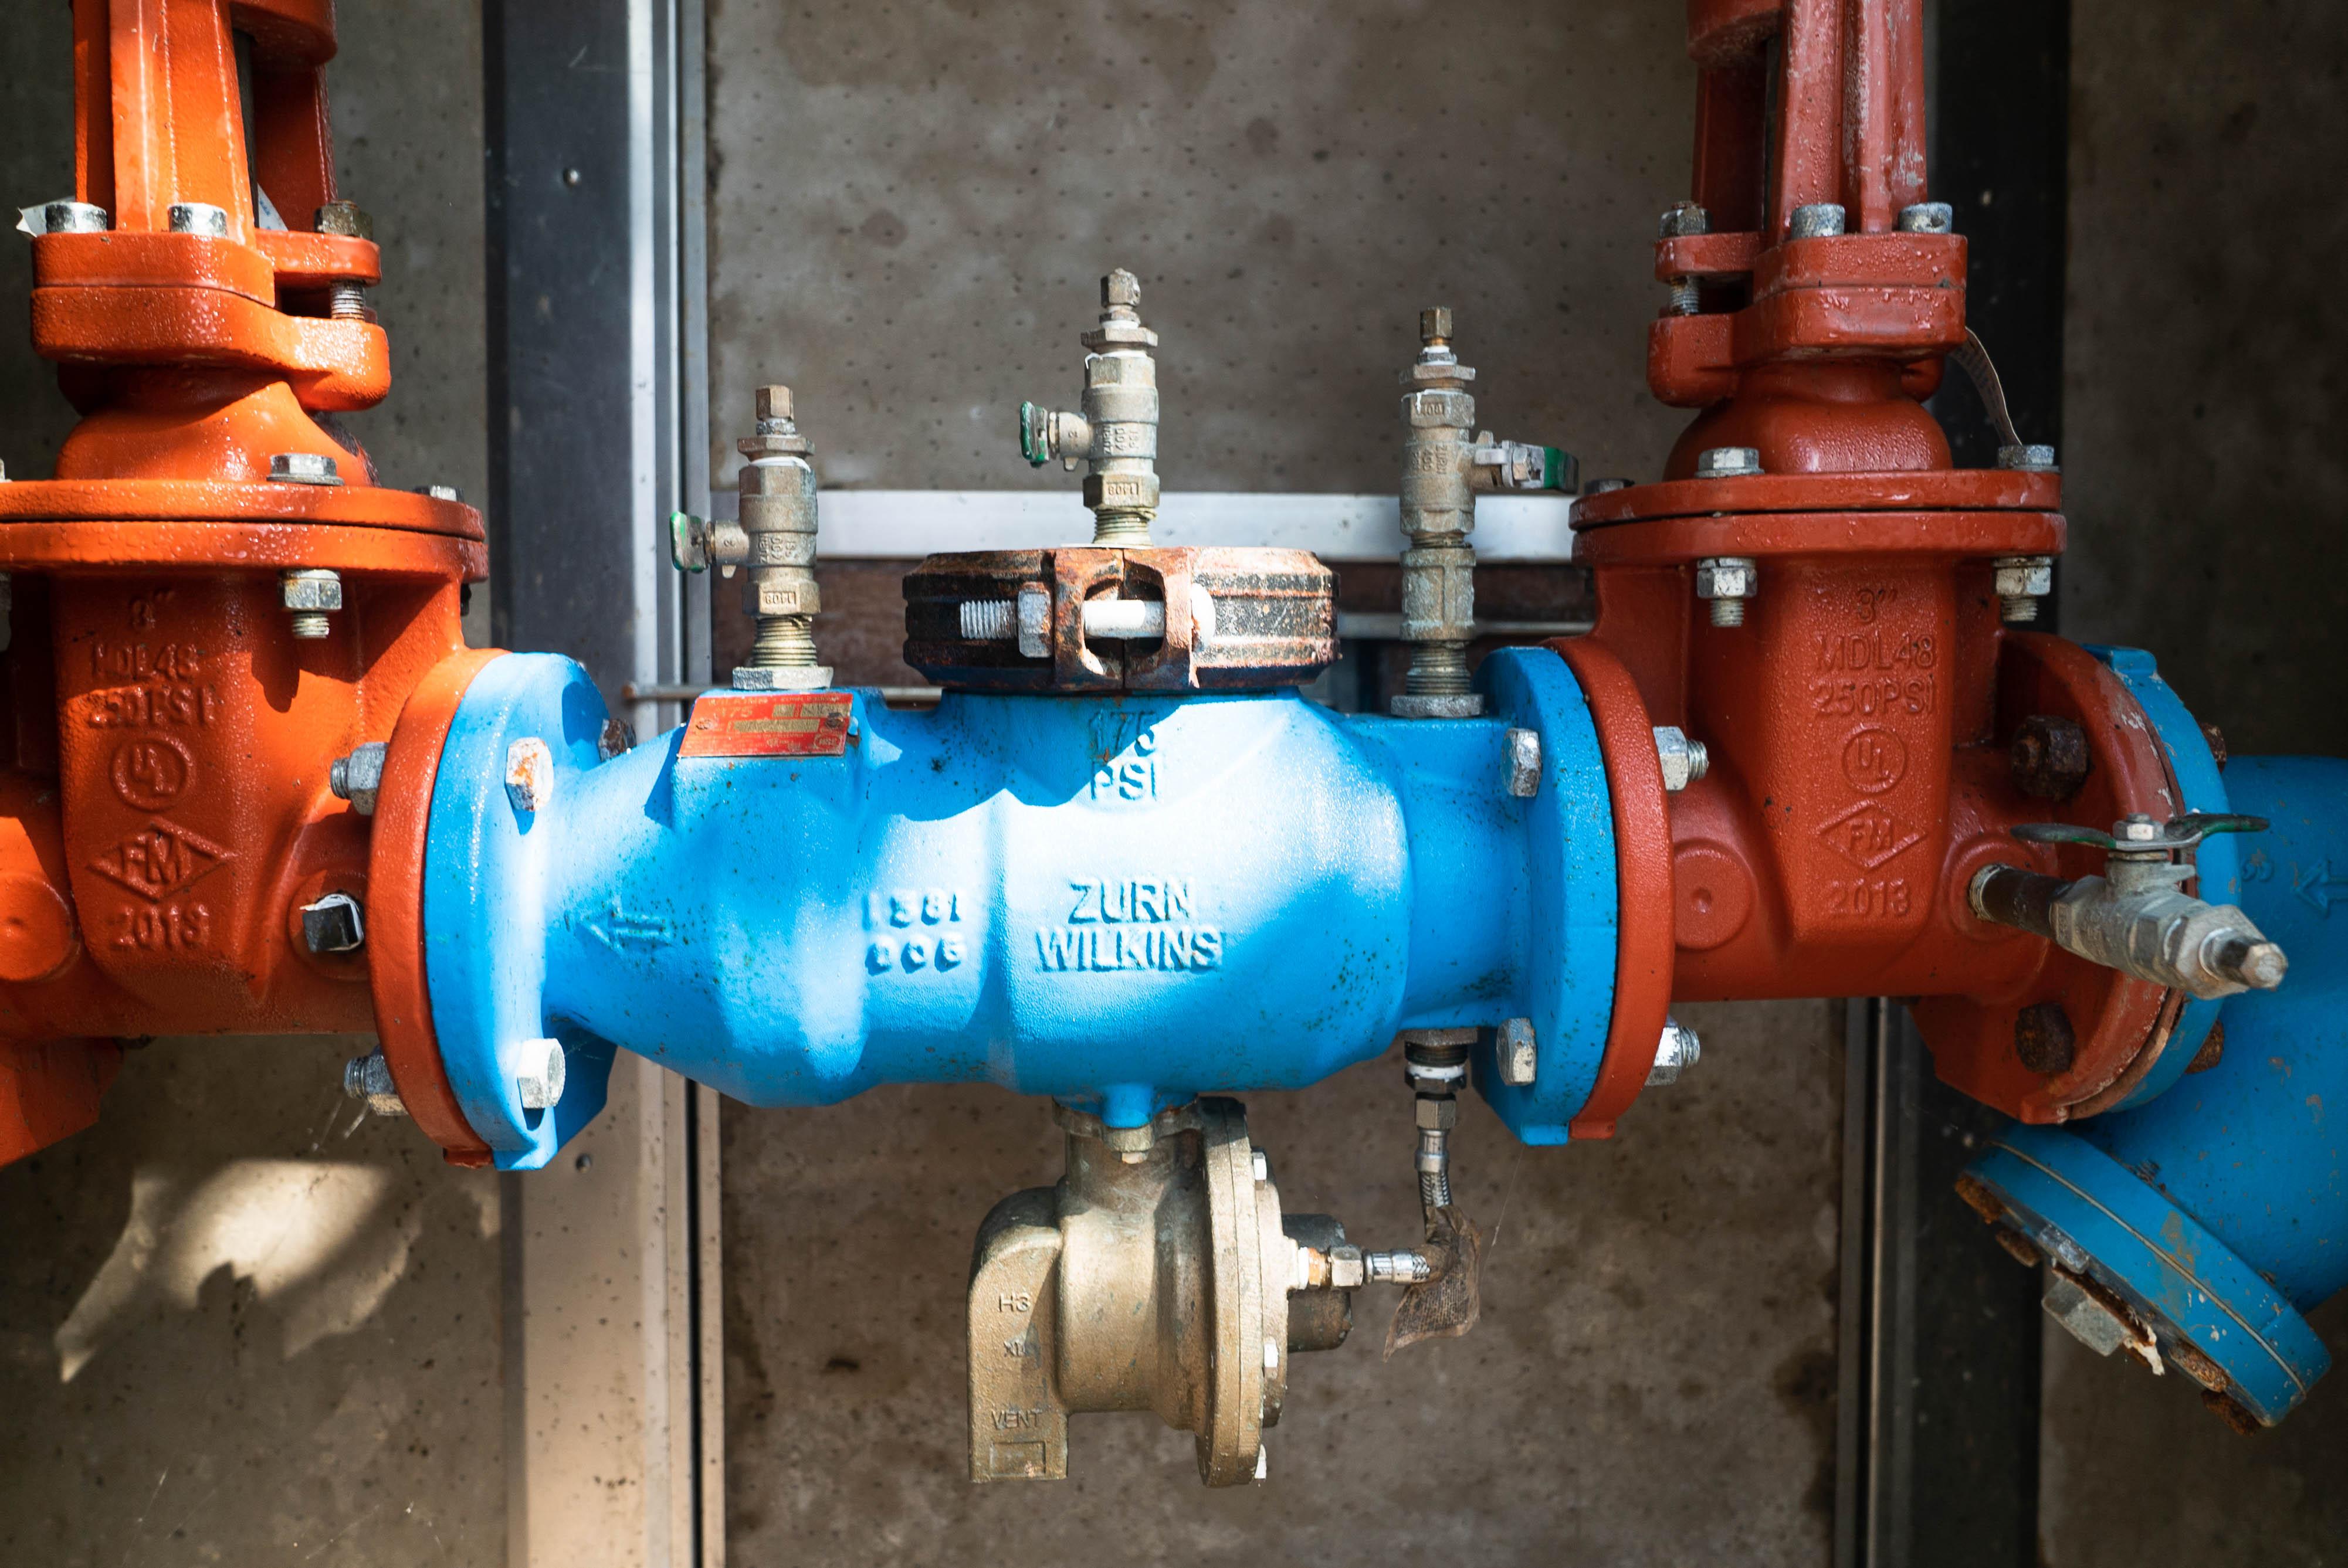 Backflow Cover Supplier - Buy Industrial Enclosures | Safe-T